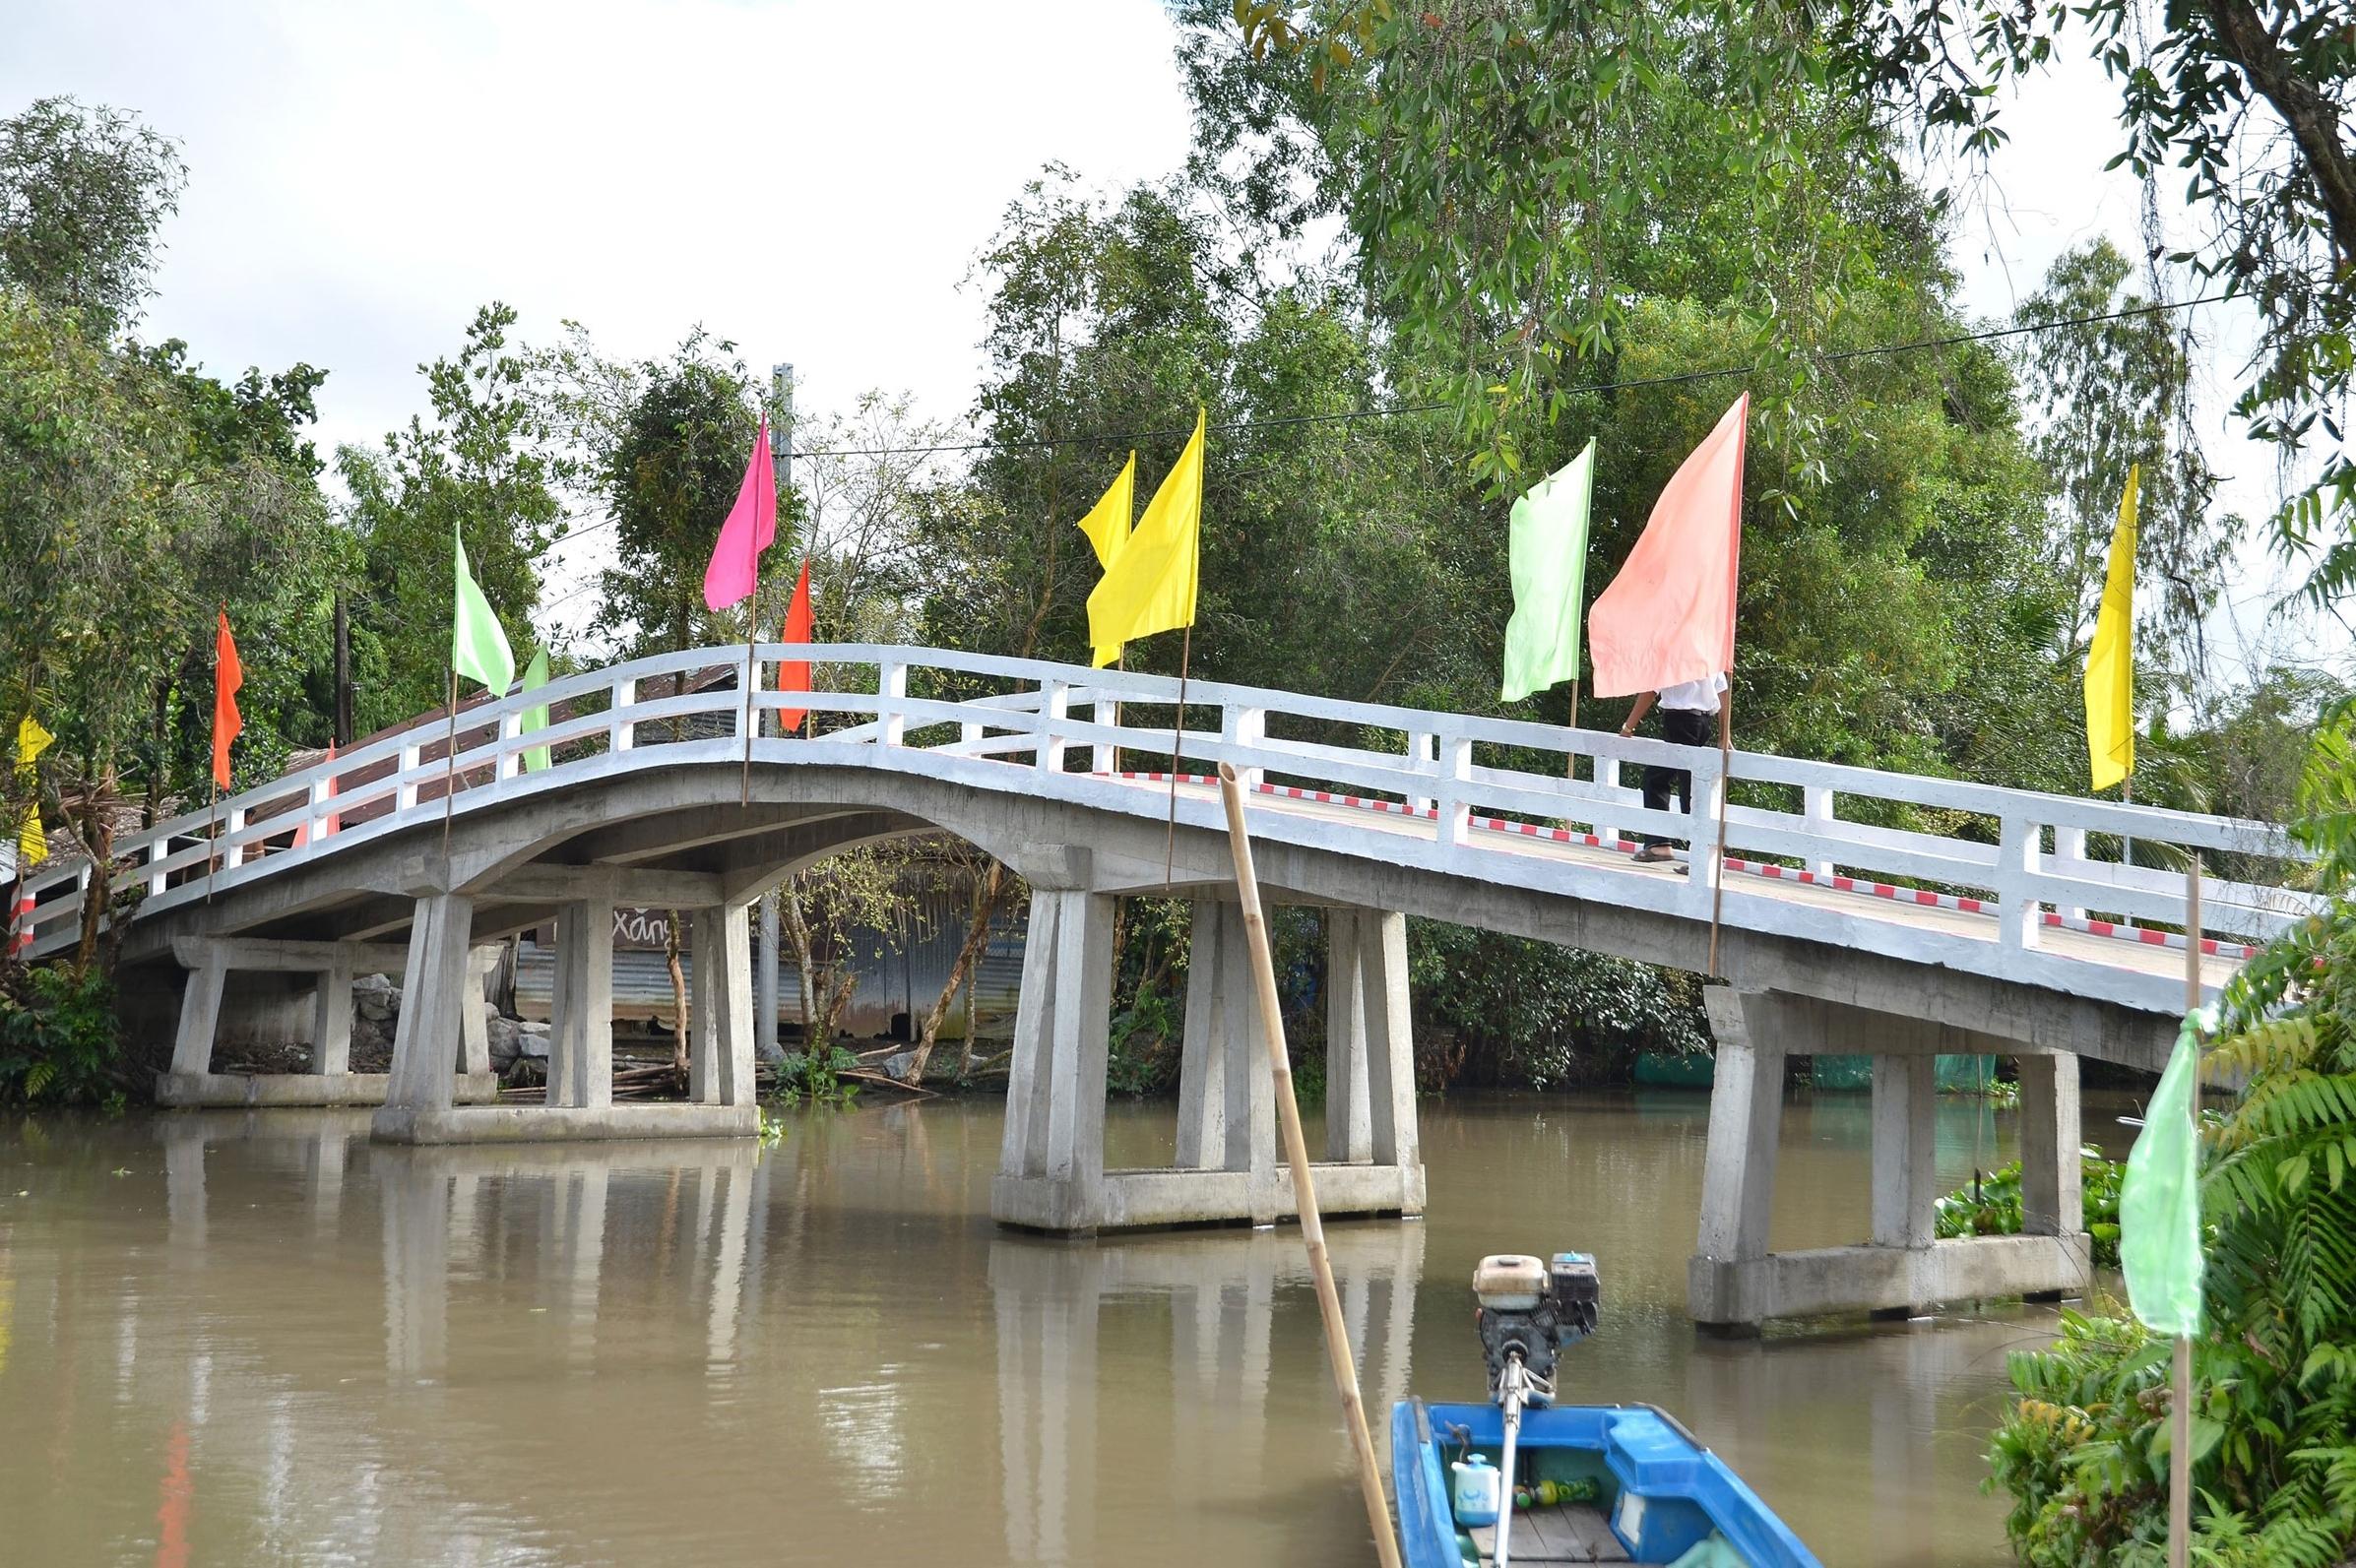 The new concrete 5-tonne bridge